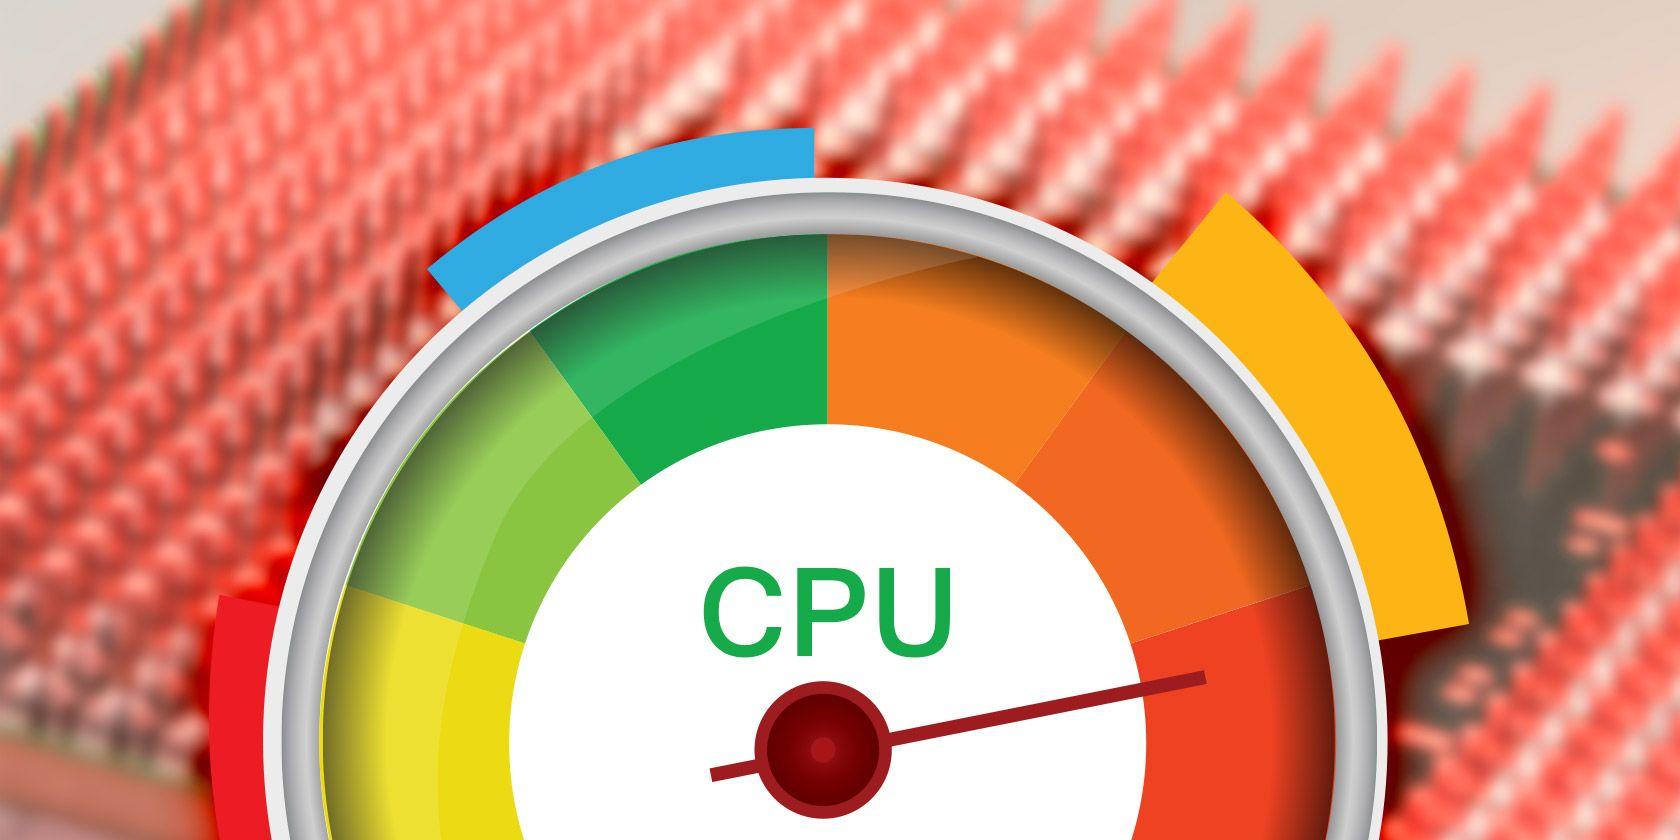 How To Fix High Cpu Usage In Windows Arduino Windows Computer